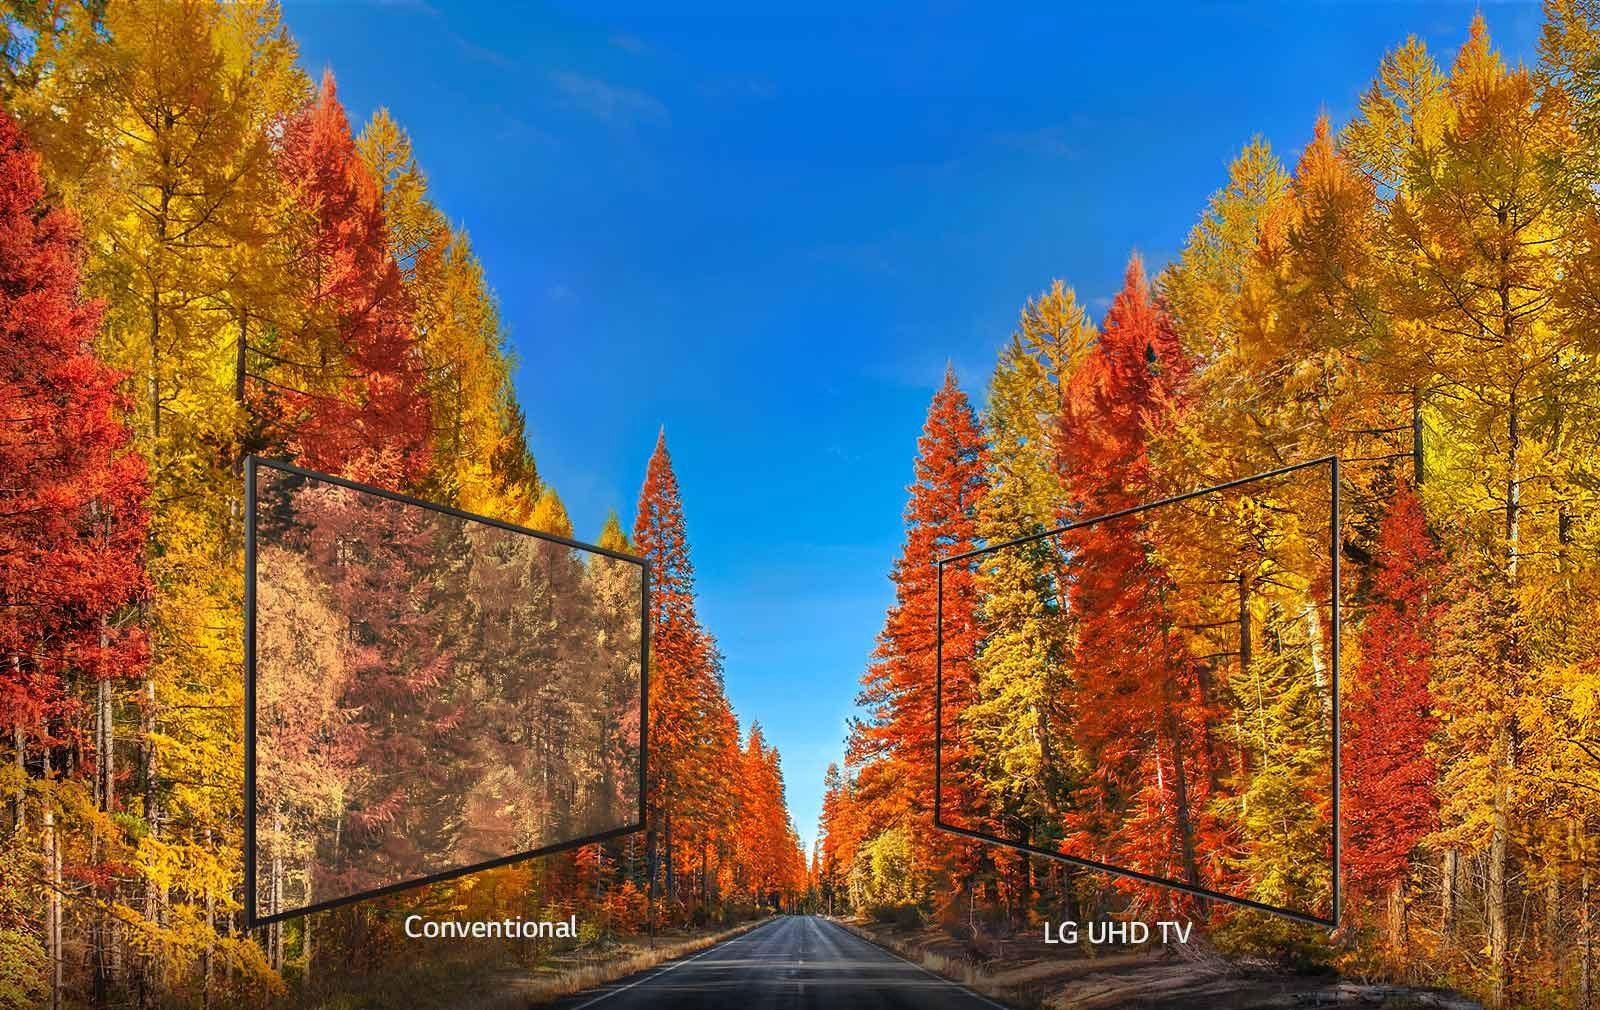 Lg 65uk6500aua 65 Inch Class 4k Hdr Smart Led Uhd Tv W Ai Thinq Telephone Wiring Colour Codes Uk 86uk70pub Wide Viewing Angle 29092018 D